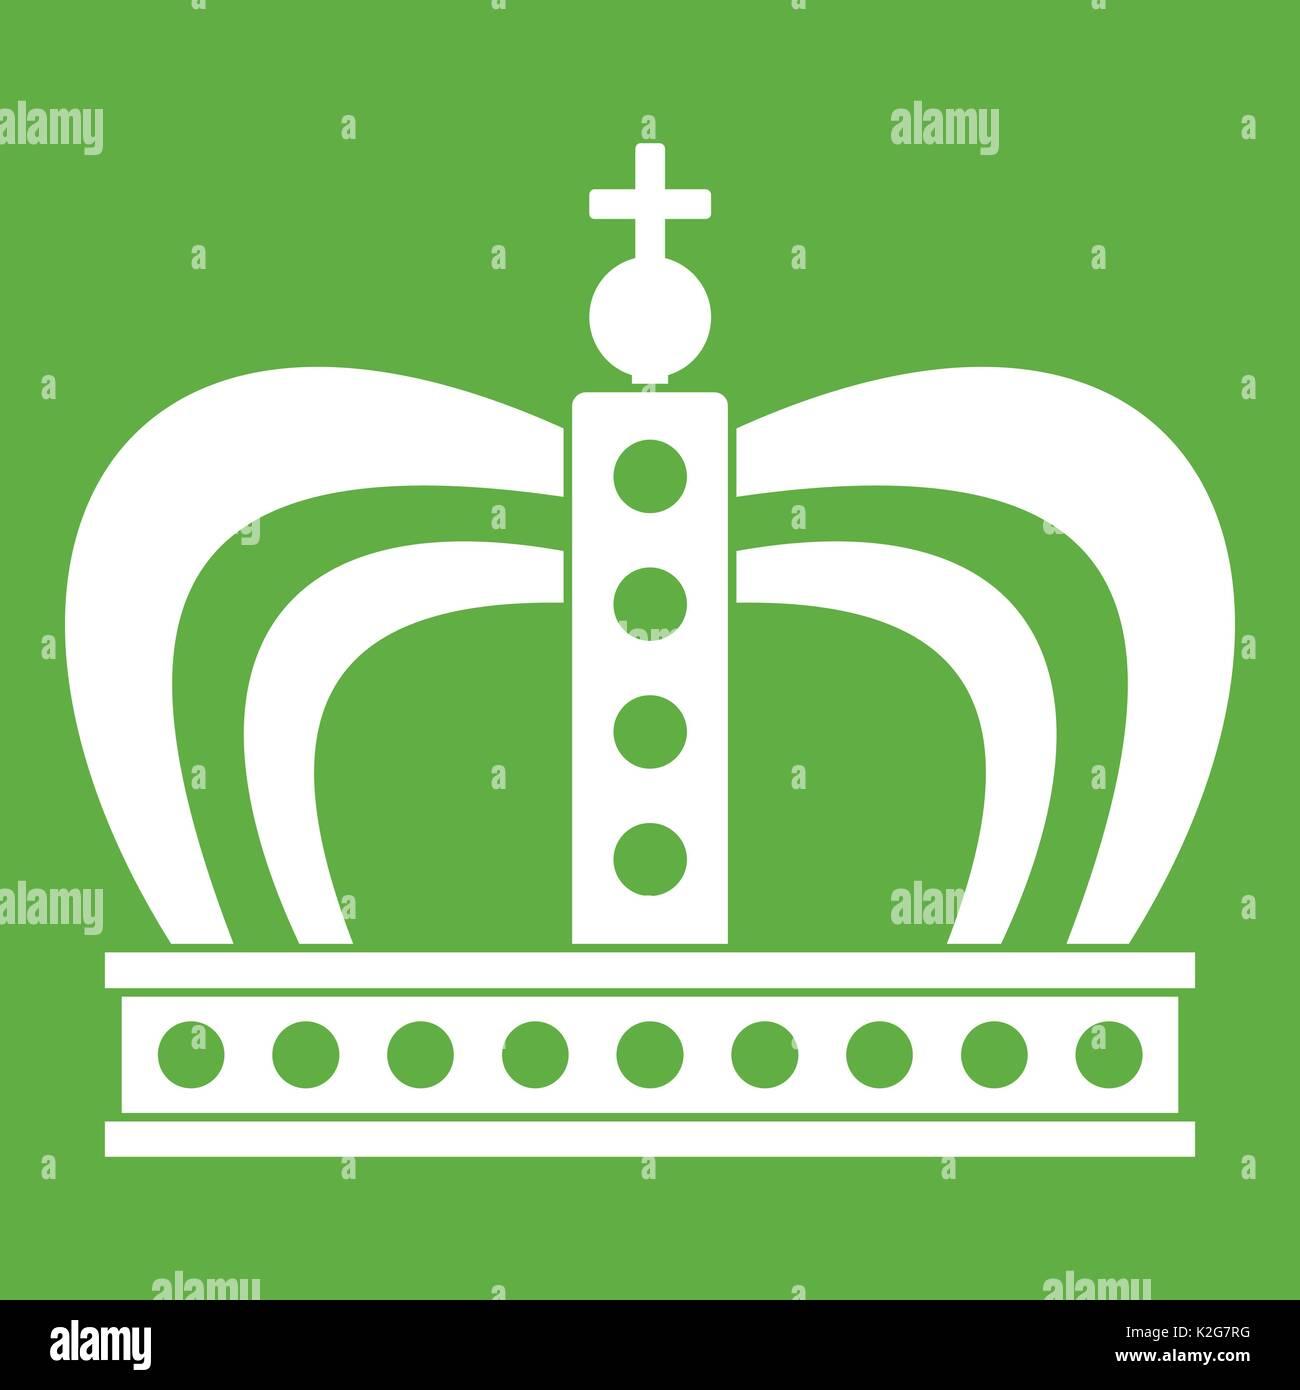 Monarchy crown icon green - Stock Vector